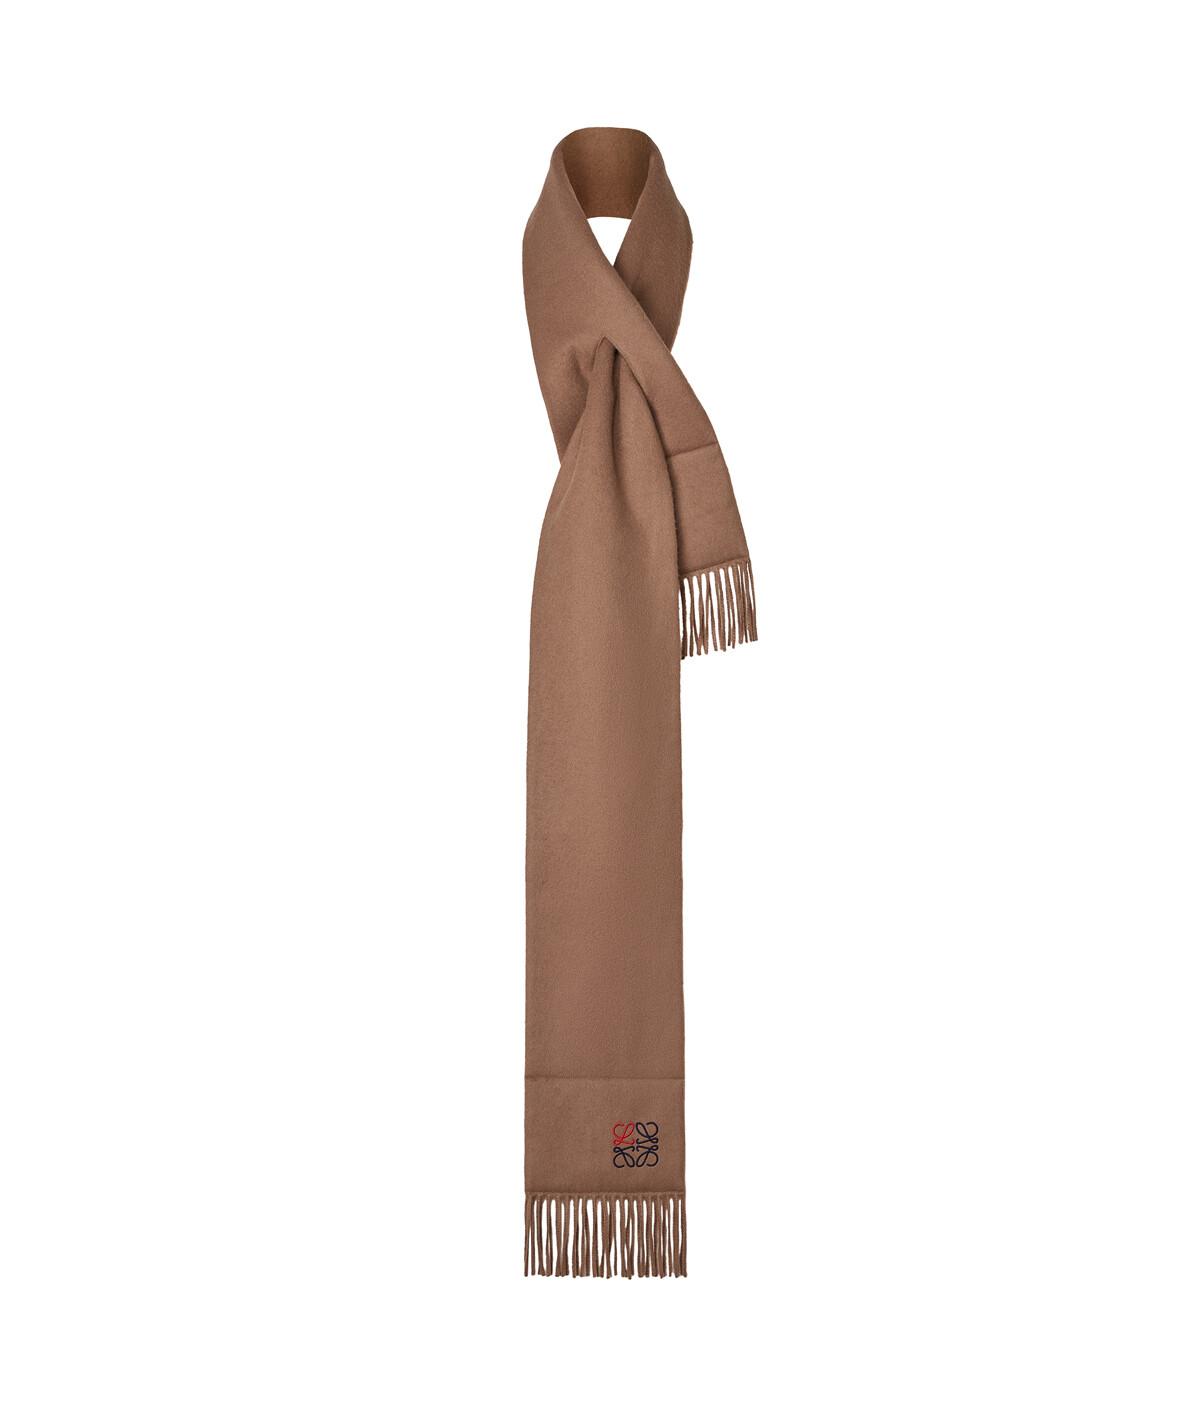 LOEWE 17X190 Anagram棉质围巾 驼色 front